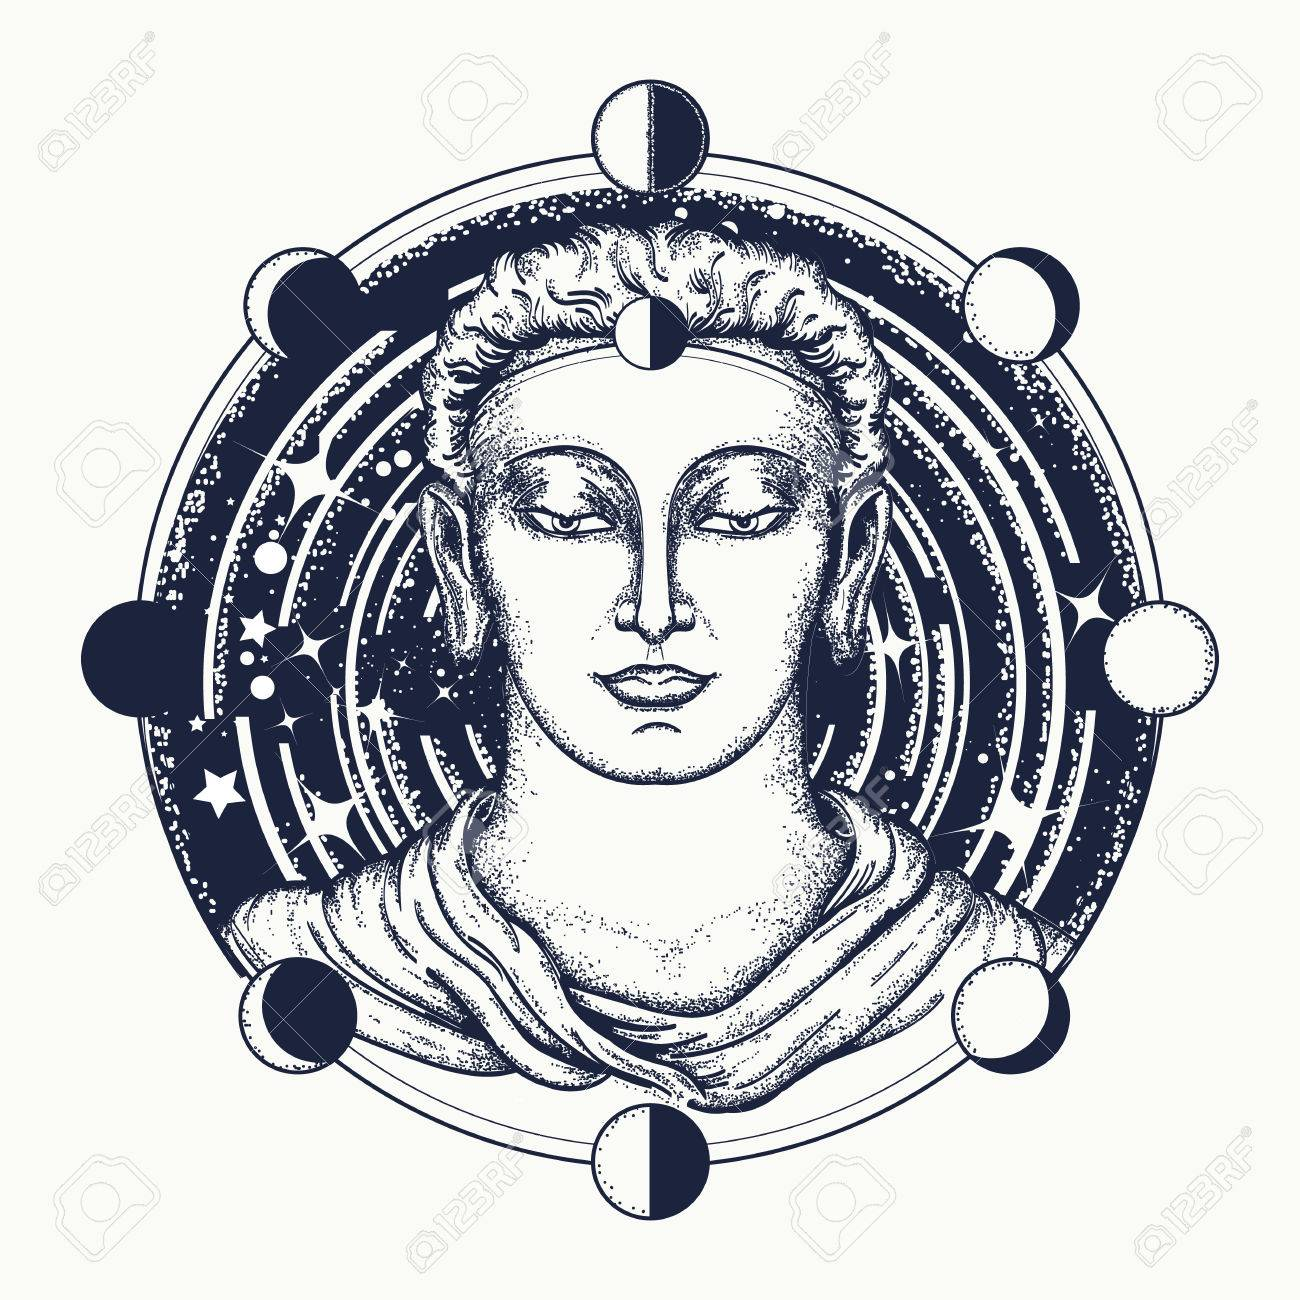 Buddha face tattoo art symbol of immortality enlightenment buddha face tattoo art symbol of immortality enlightenment religion magic space biocorpaavc Images